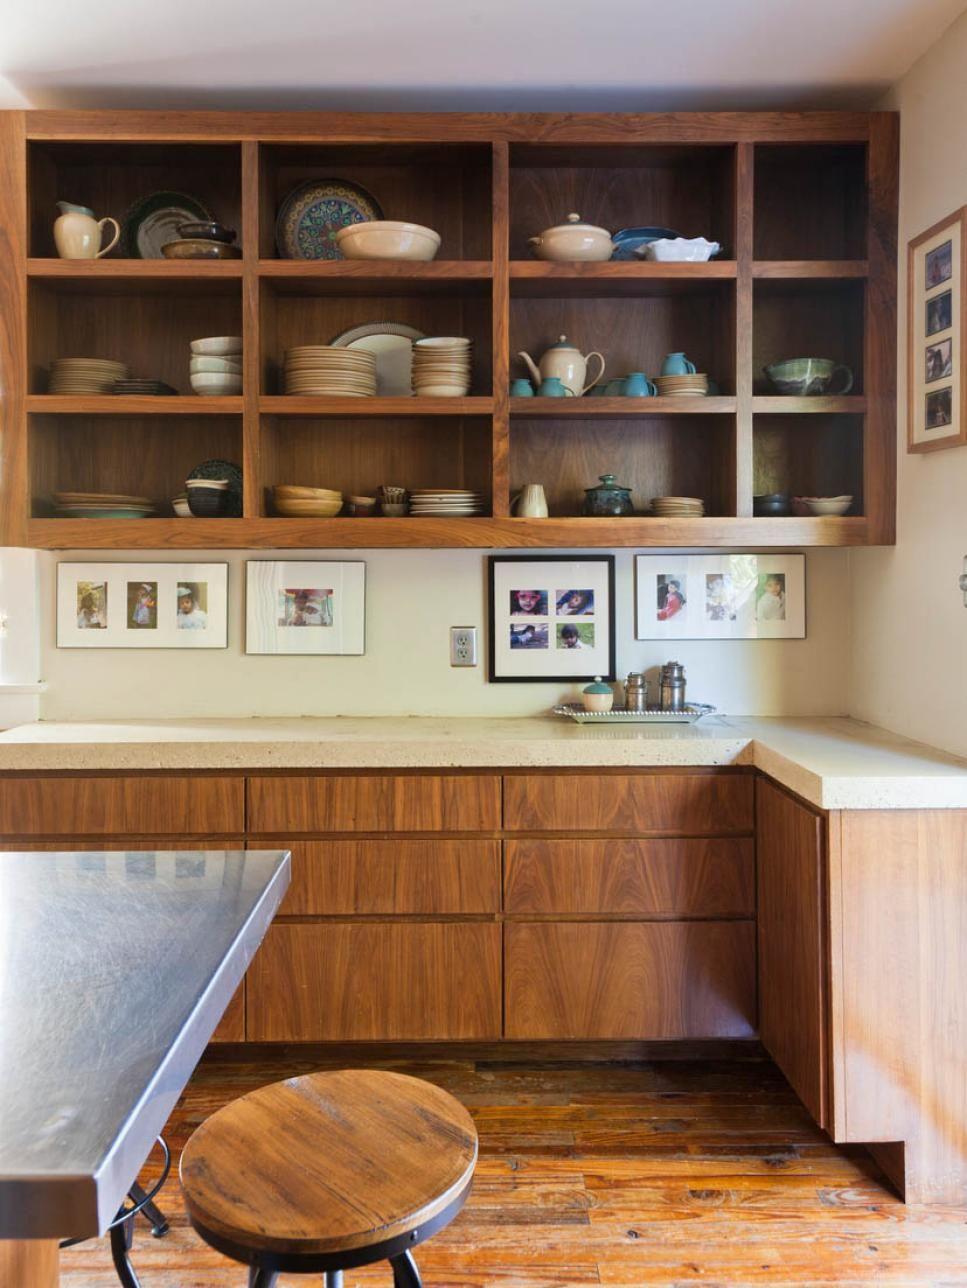 Tips For Open Shelving In The Kitchen Open Kitchen Cabinets Open Kitchen Shelves Modern Retro Kitchen